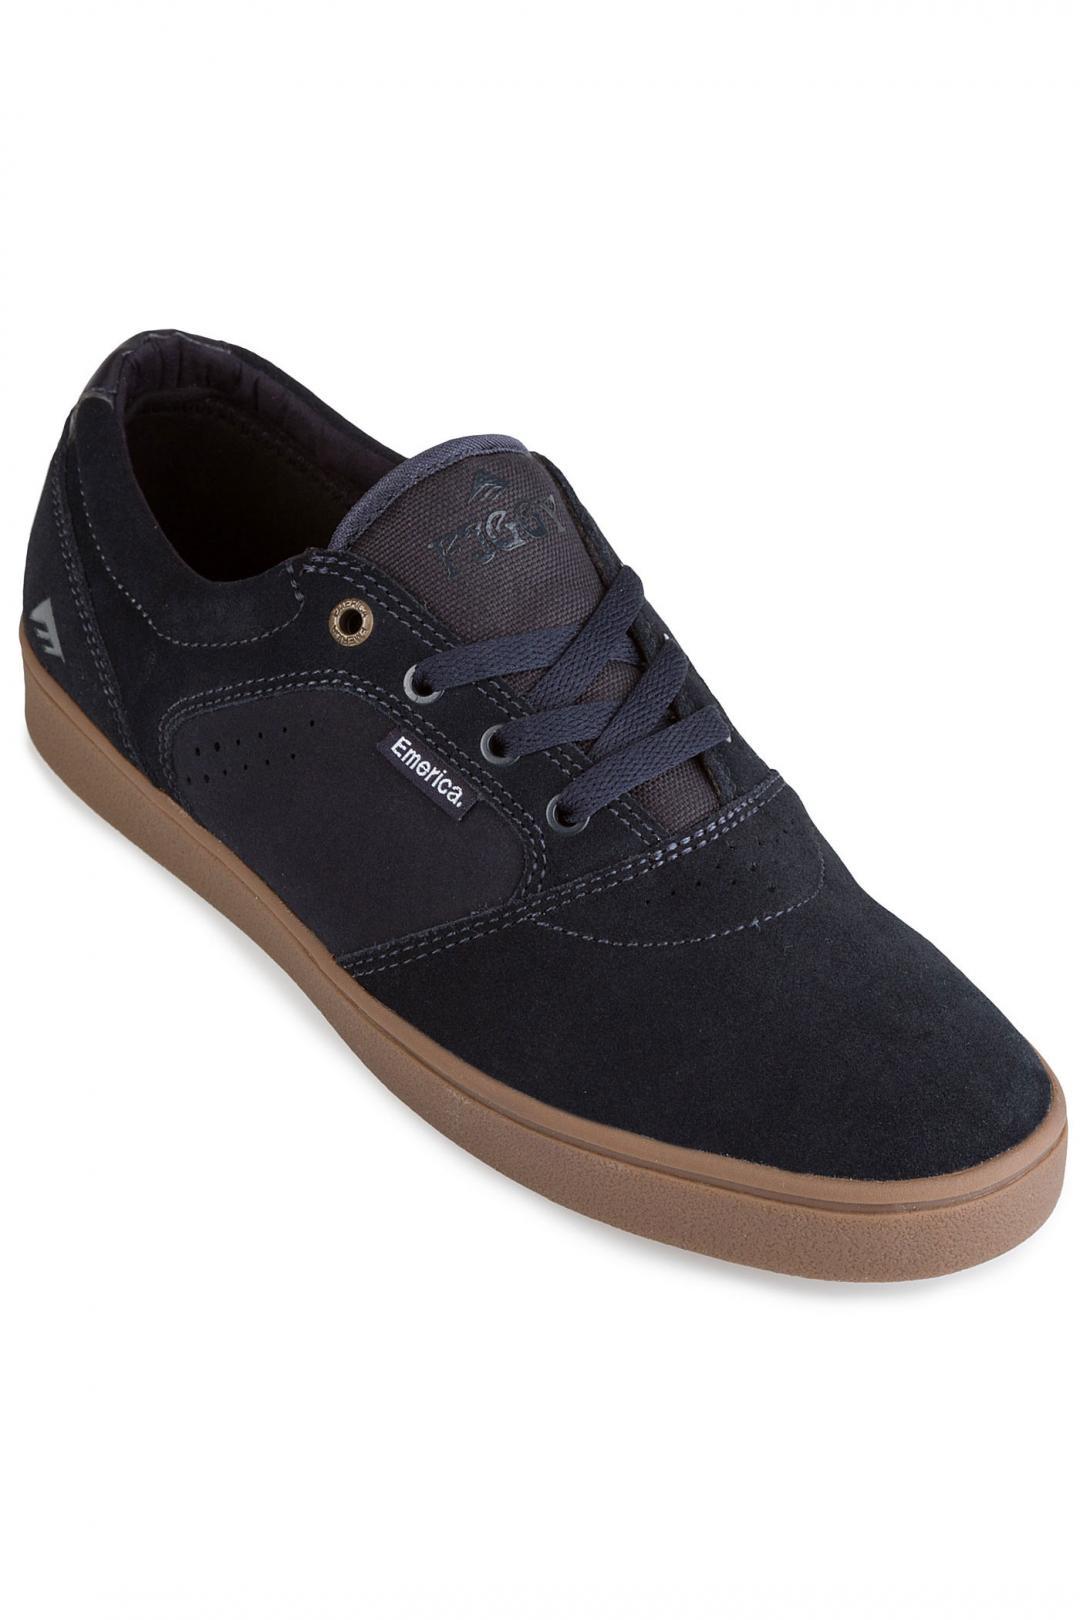 Uomo Emerica Figgy Dose navy gum | Sneakers low top